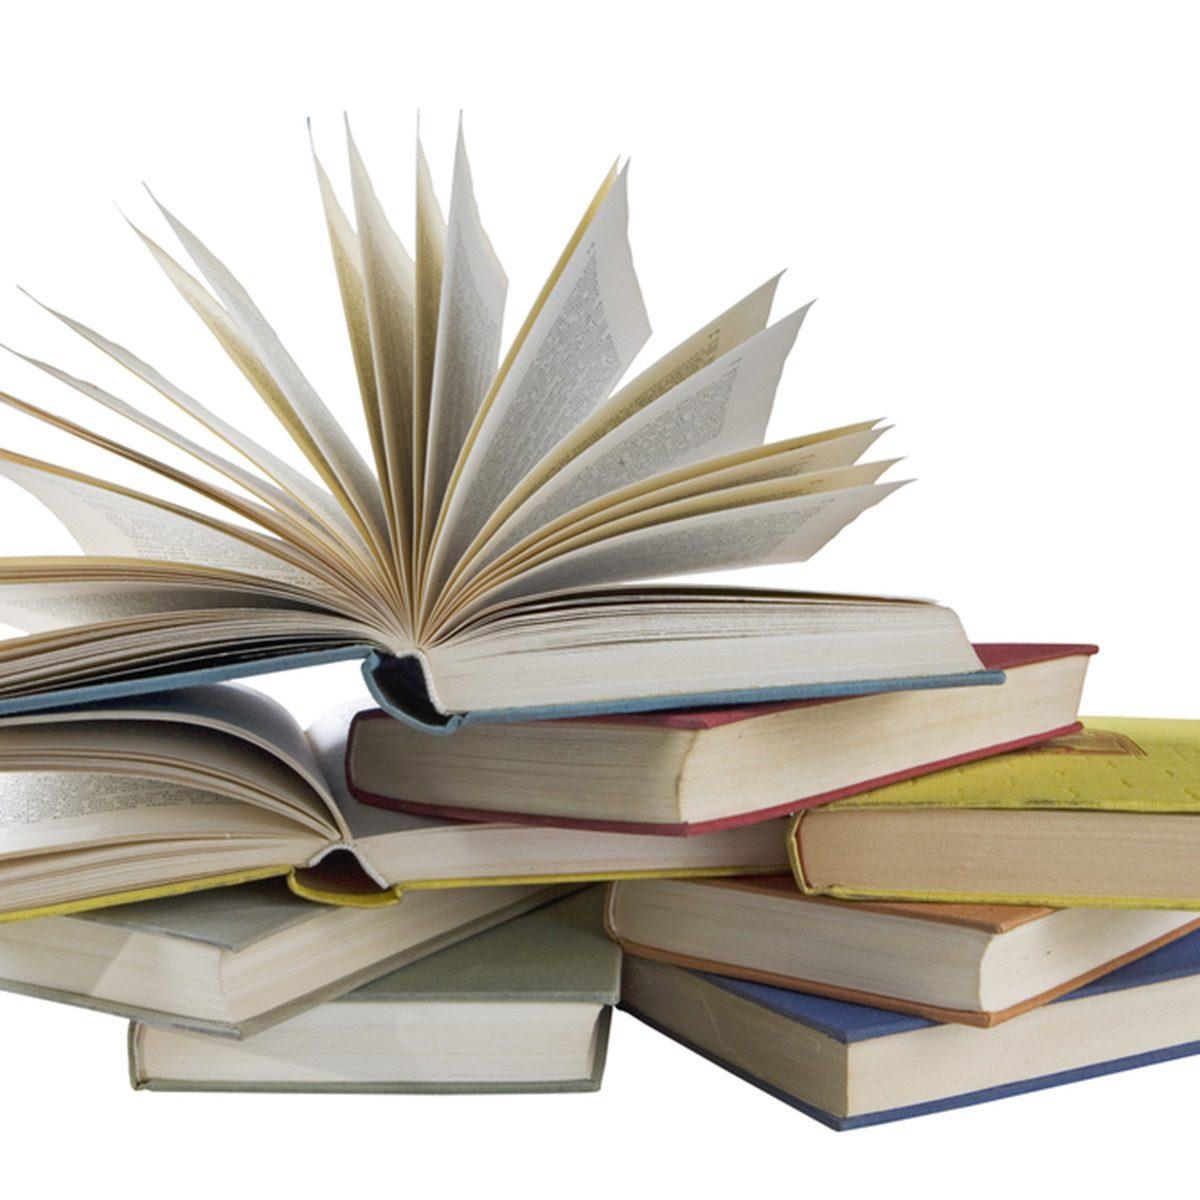 Smelly Books